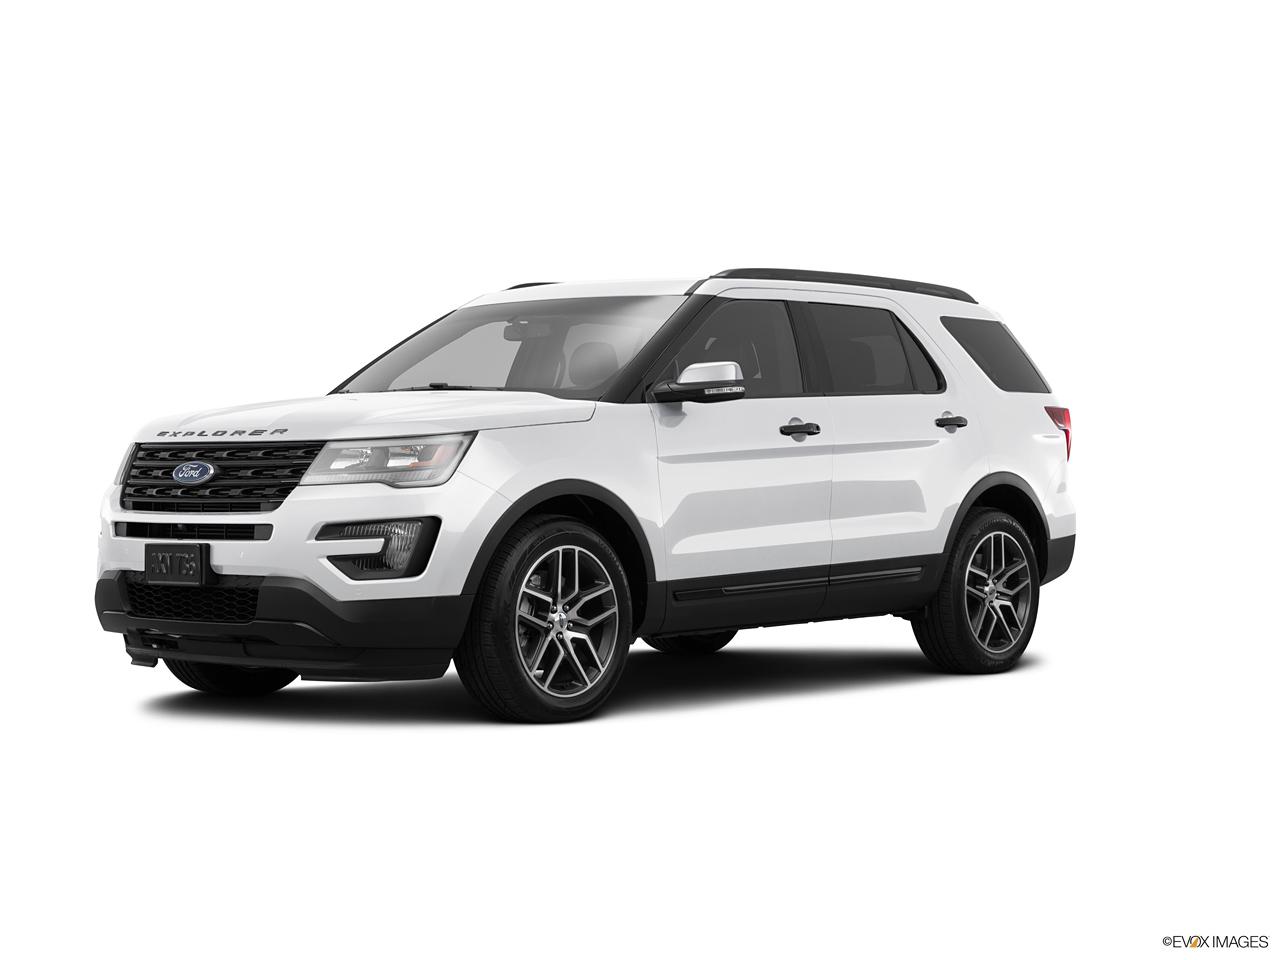 ford explorer 2017 3 5l v6 sport ecoboost in kuwait new car prices specs reviews photos. Black Bedroom Furniture Sets. Home Design Ideas